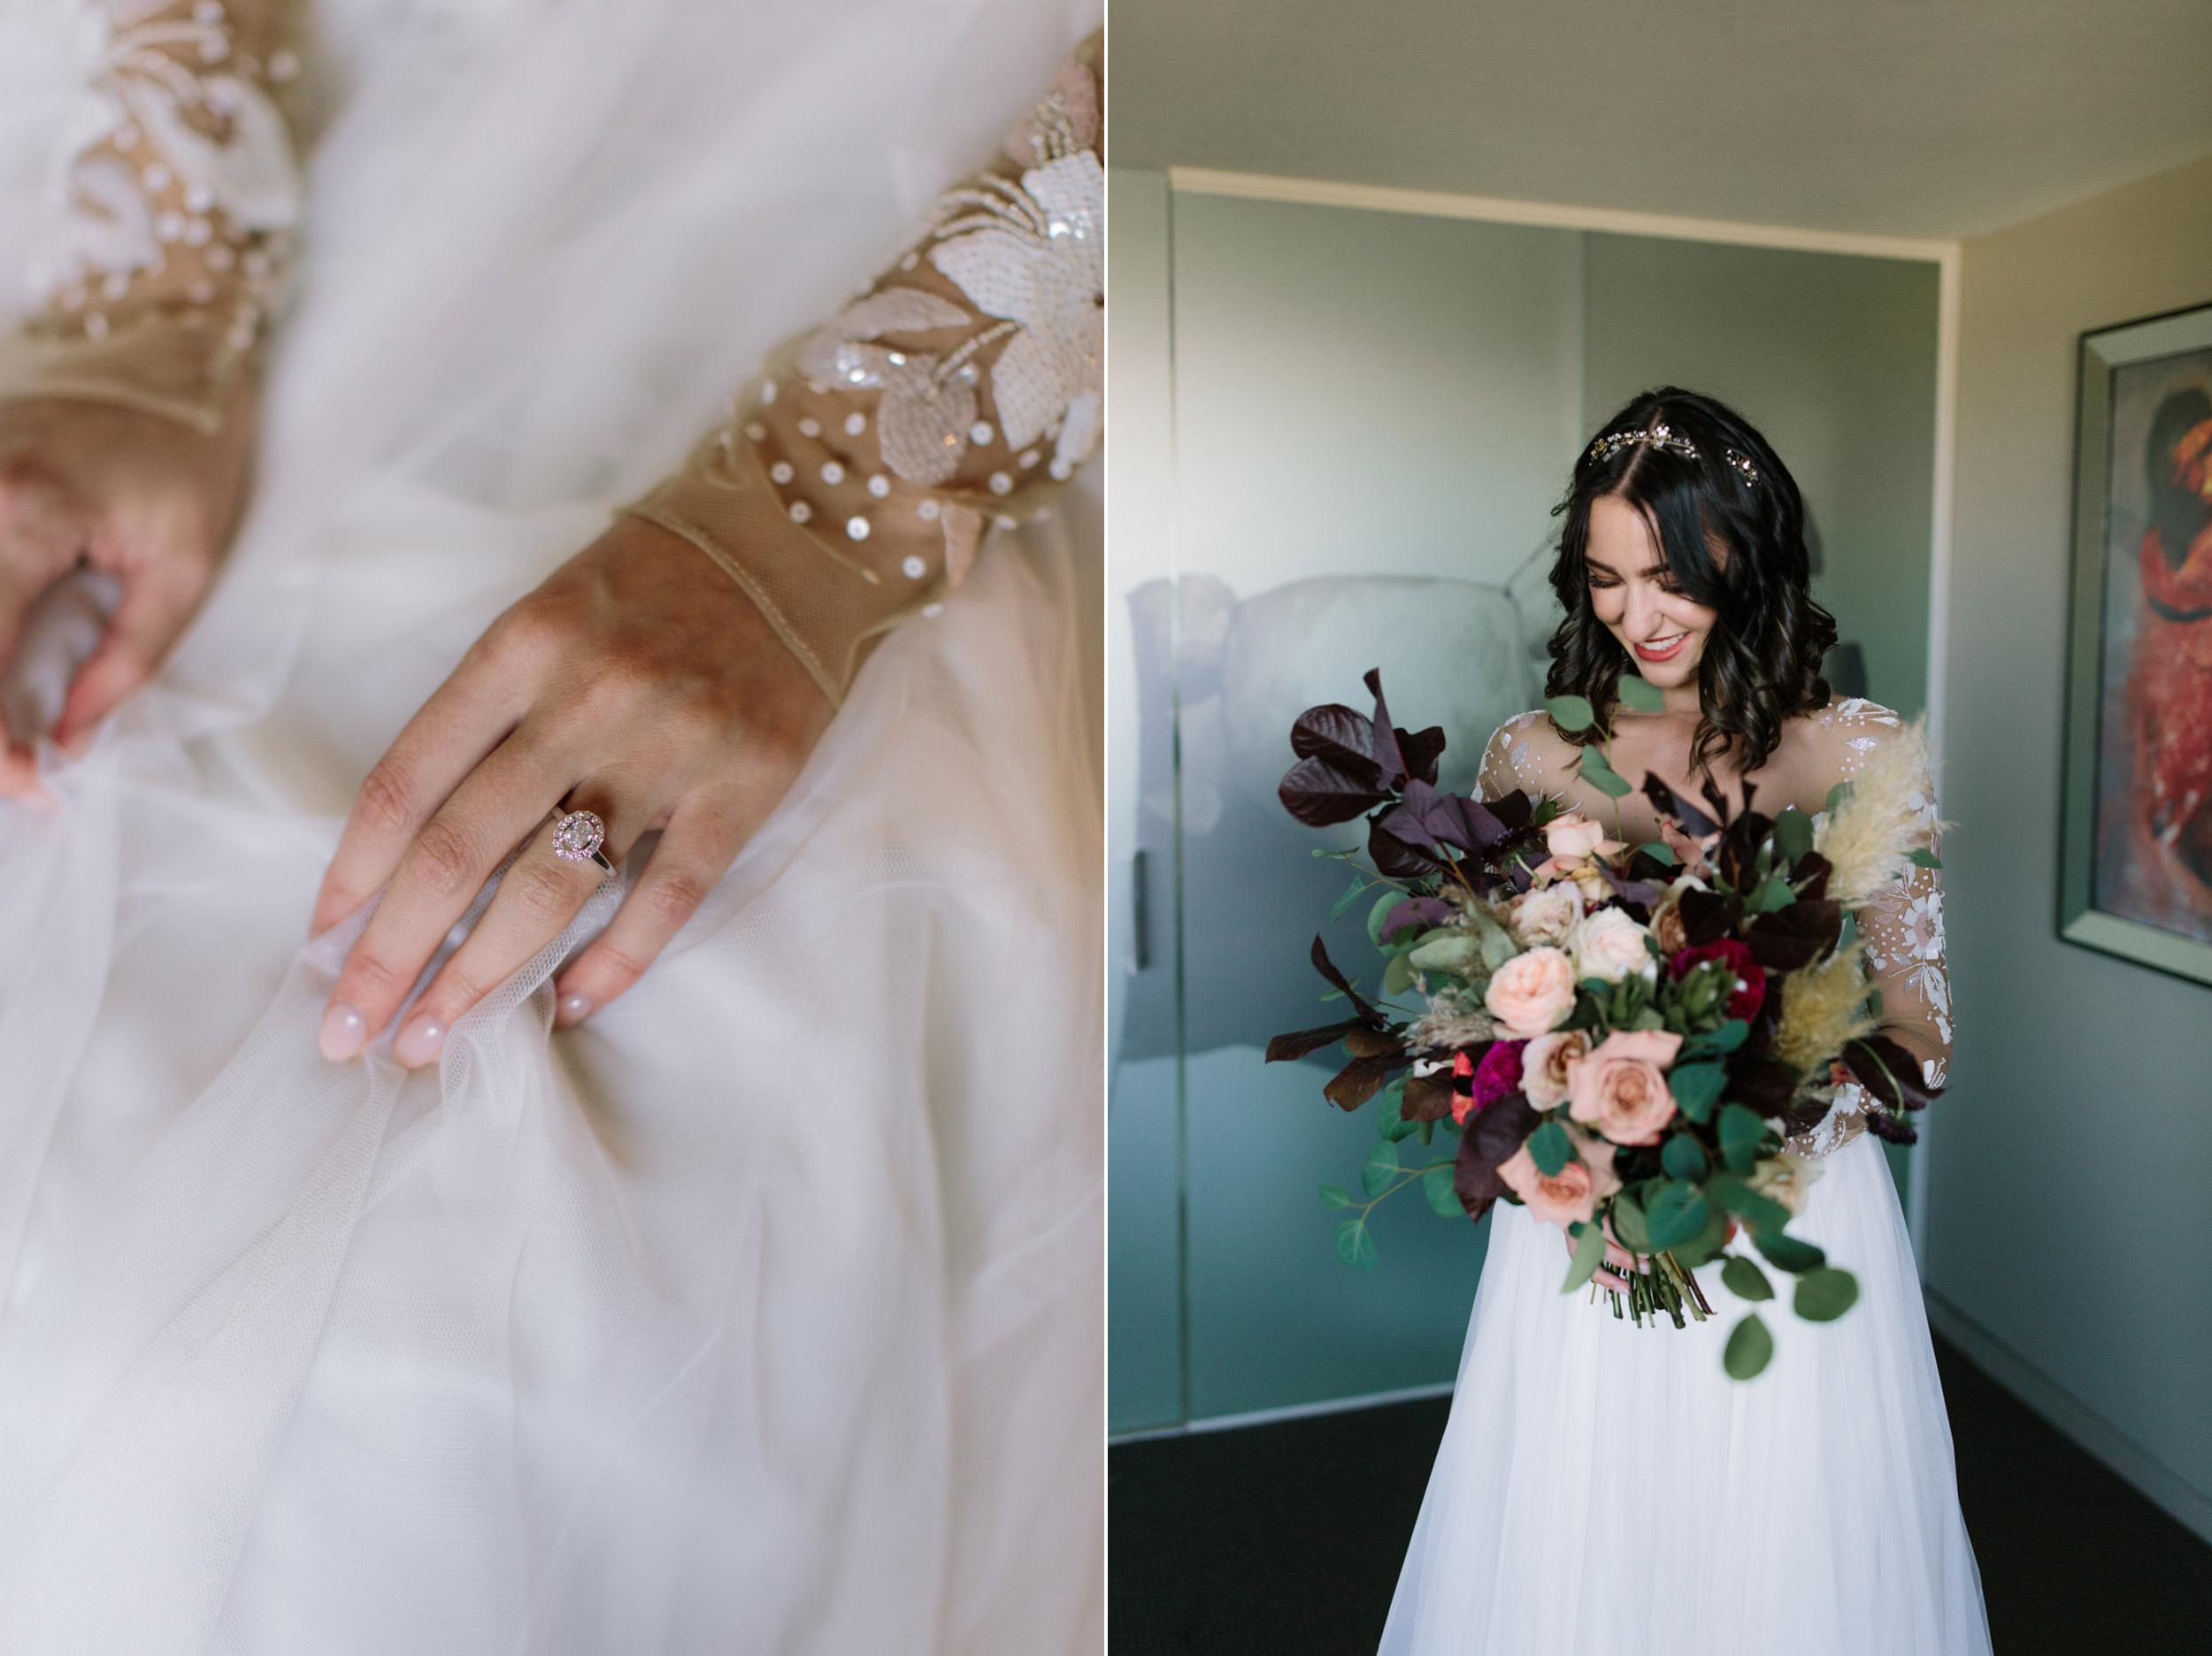 I-Got-You-Babe-Weddings-Hayley-Sam-NGV-Melbourne0012.JPG